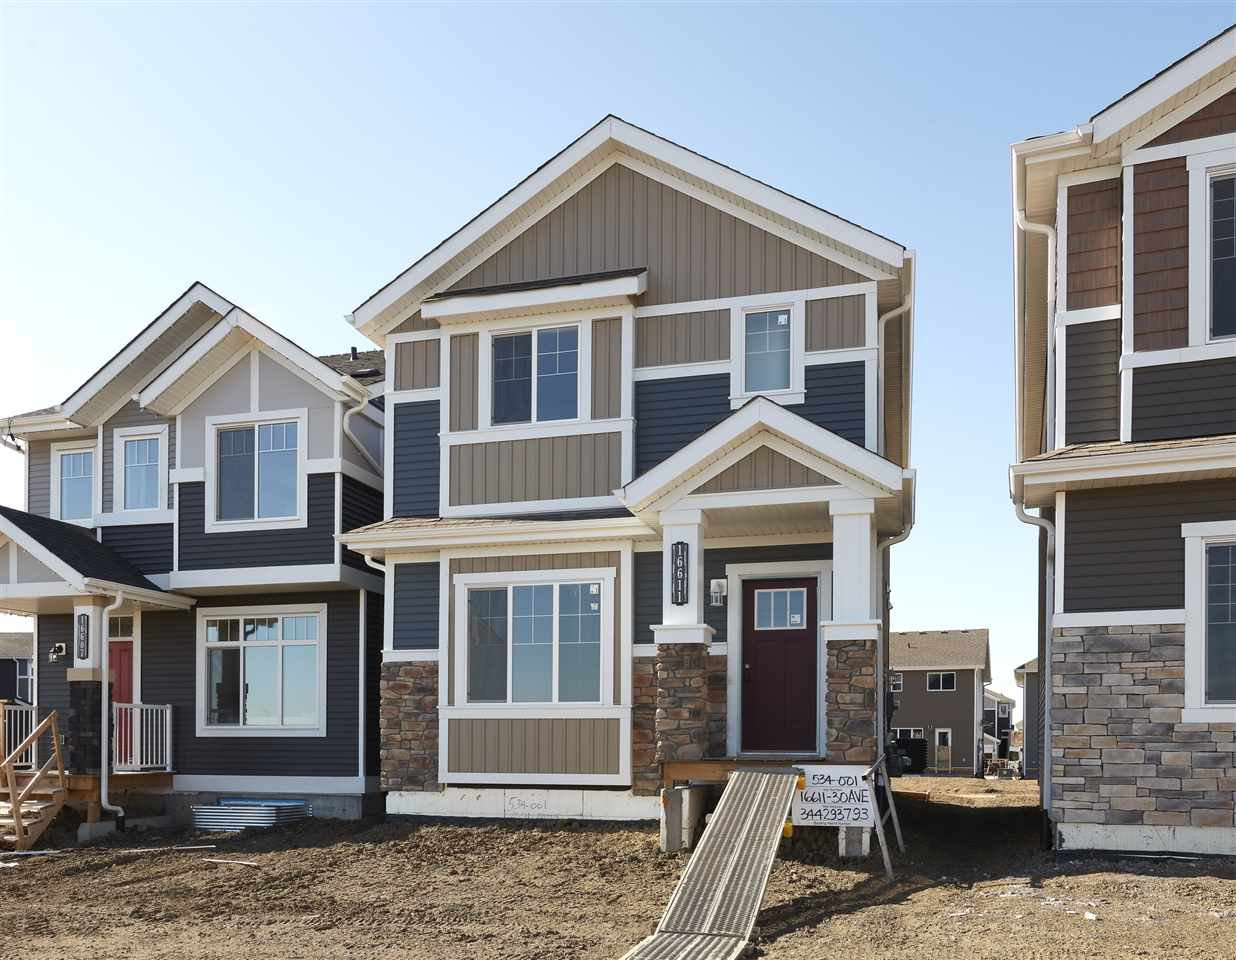 Main Photo: 16611 30 Avenue in Edmonton: Zone 56 House for sale : MLS®# E4200893